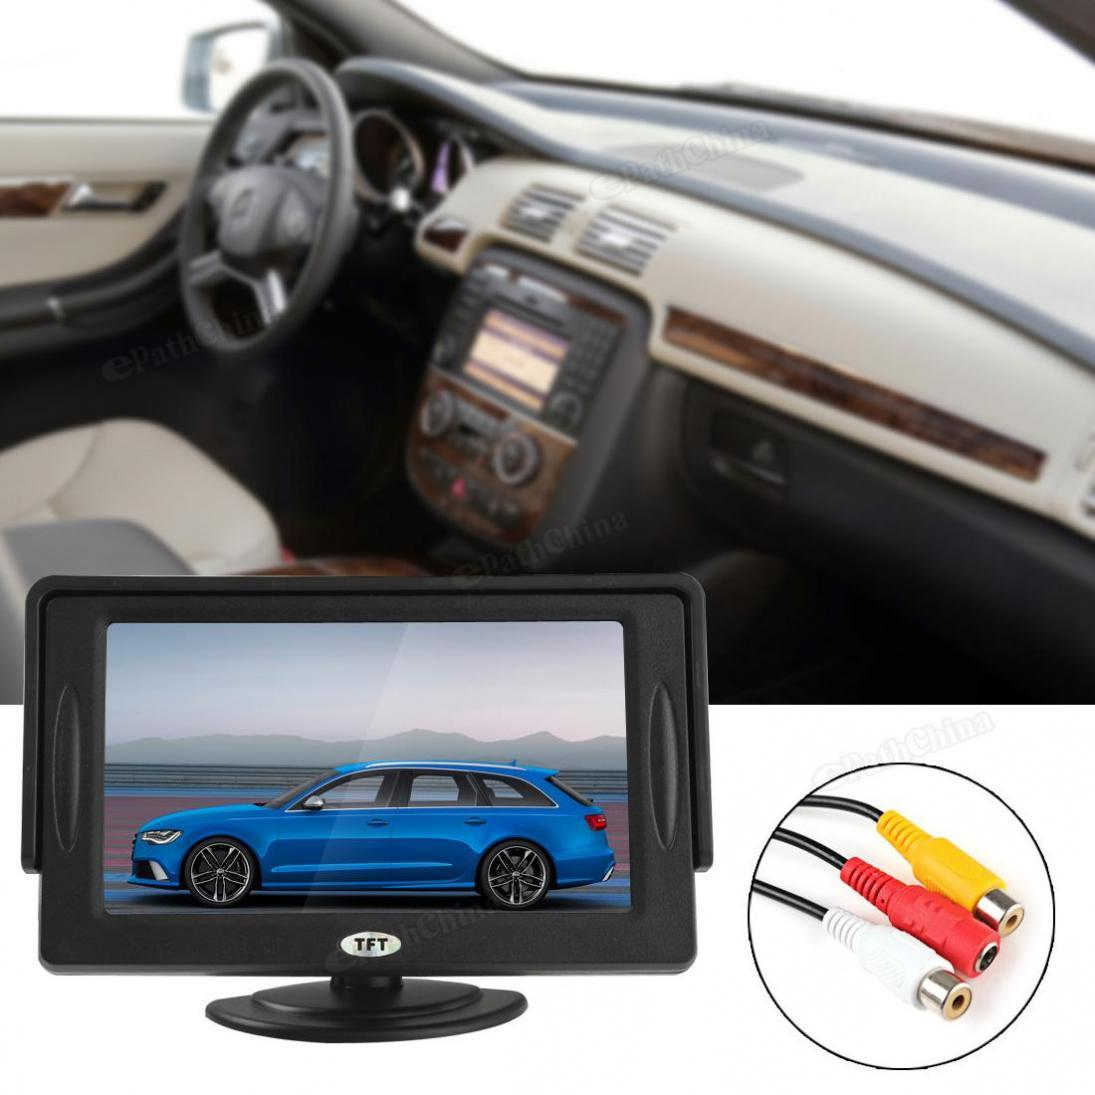 4.3 Inch 480x272 2-Channel Input Car Rear View Monitor Ukuran Pocket Warna TFT LCD Display